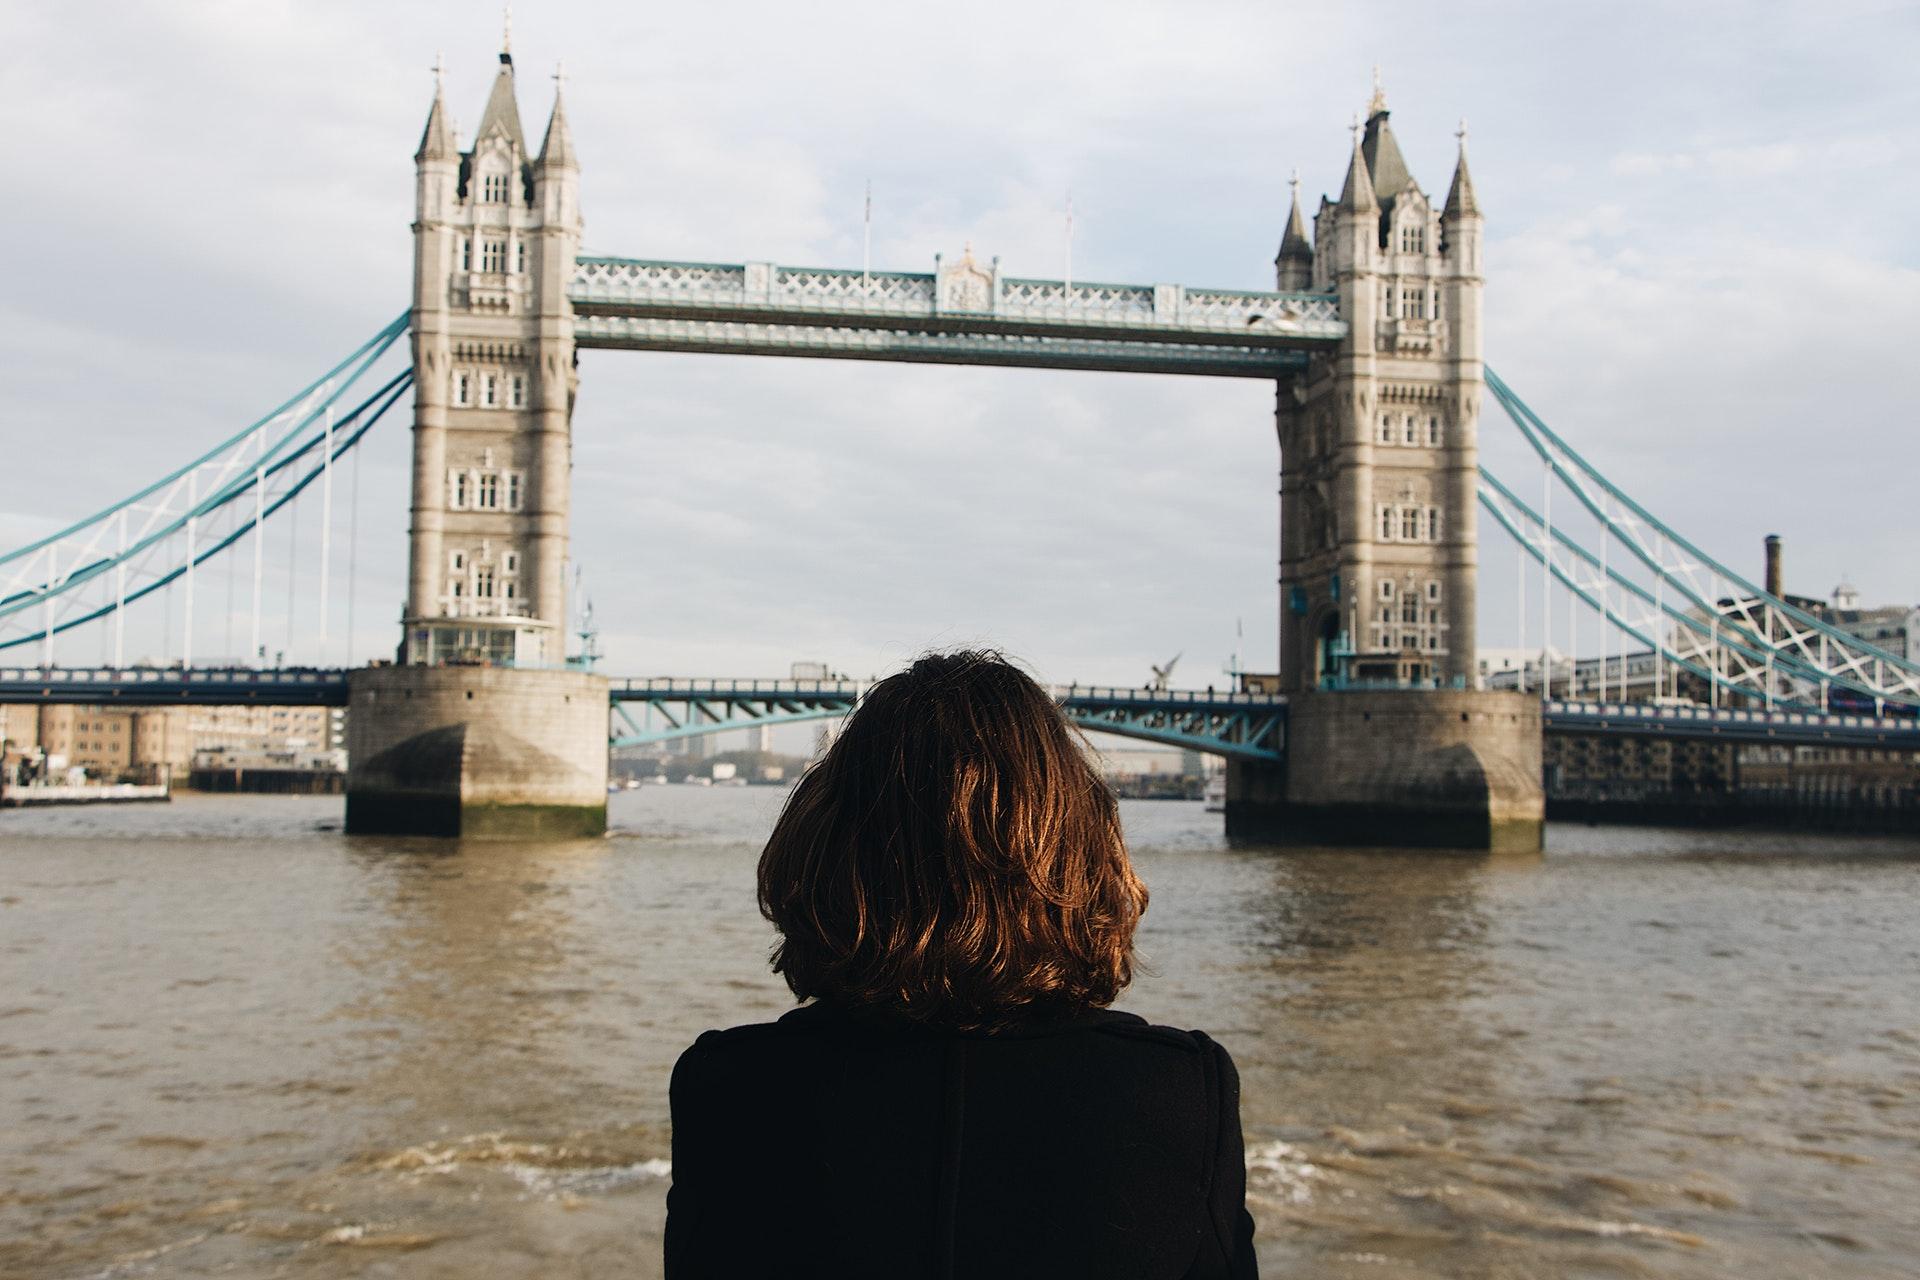 Intercâmbio: 5 formas de economizar no Reino Unido